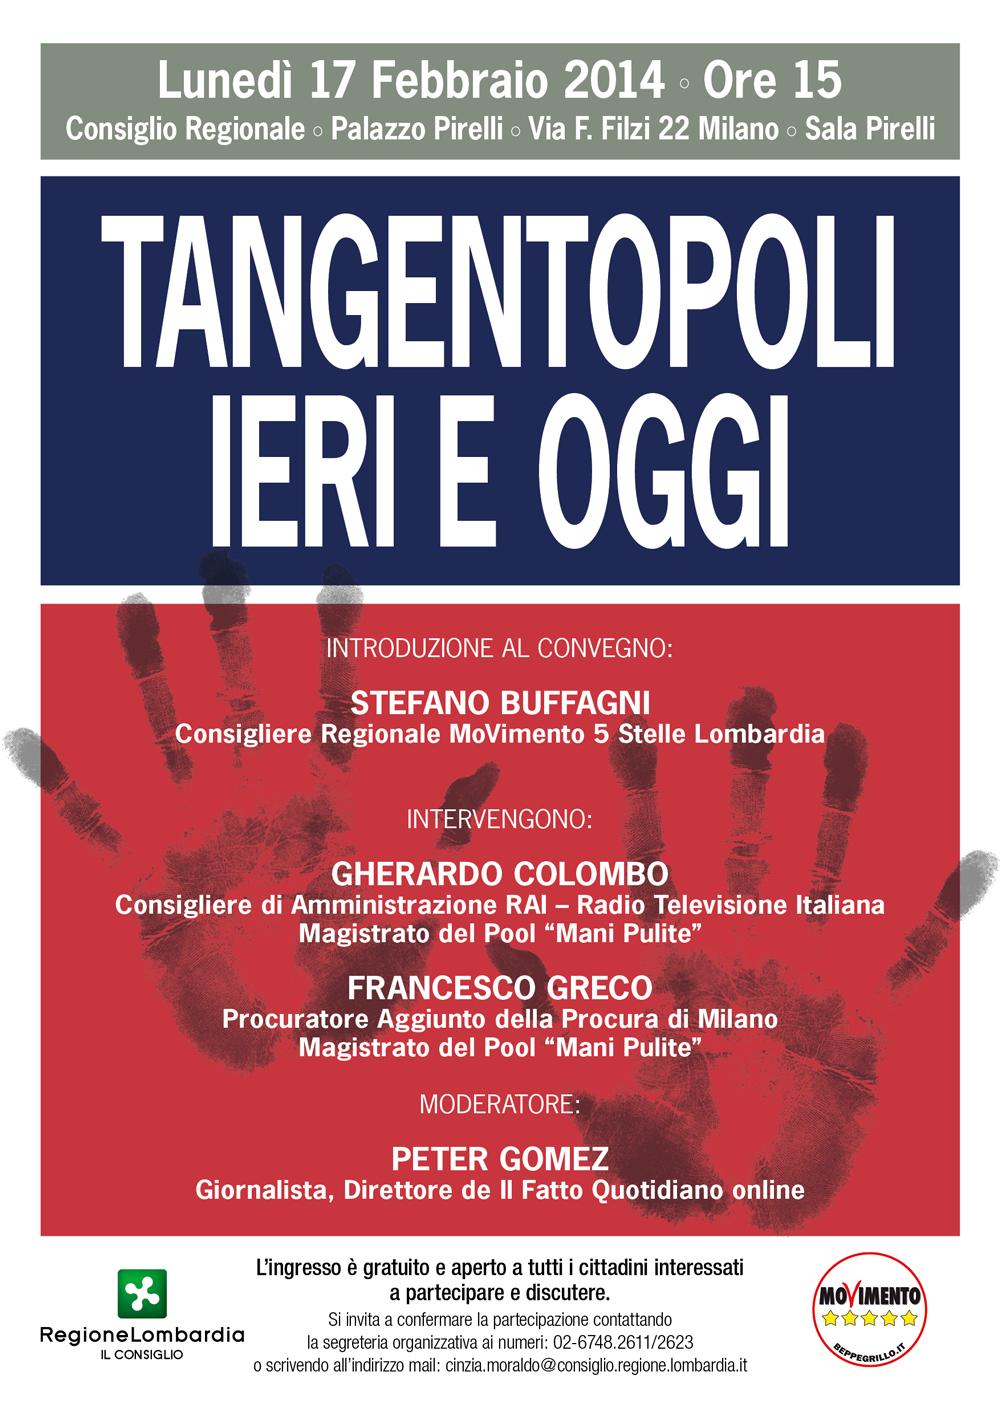 Convegno: Tangentopoli ieri e oggi – 17 febbraio 2014